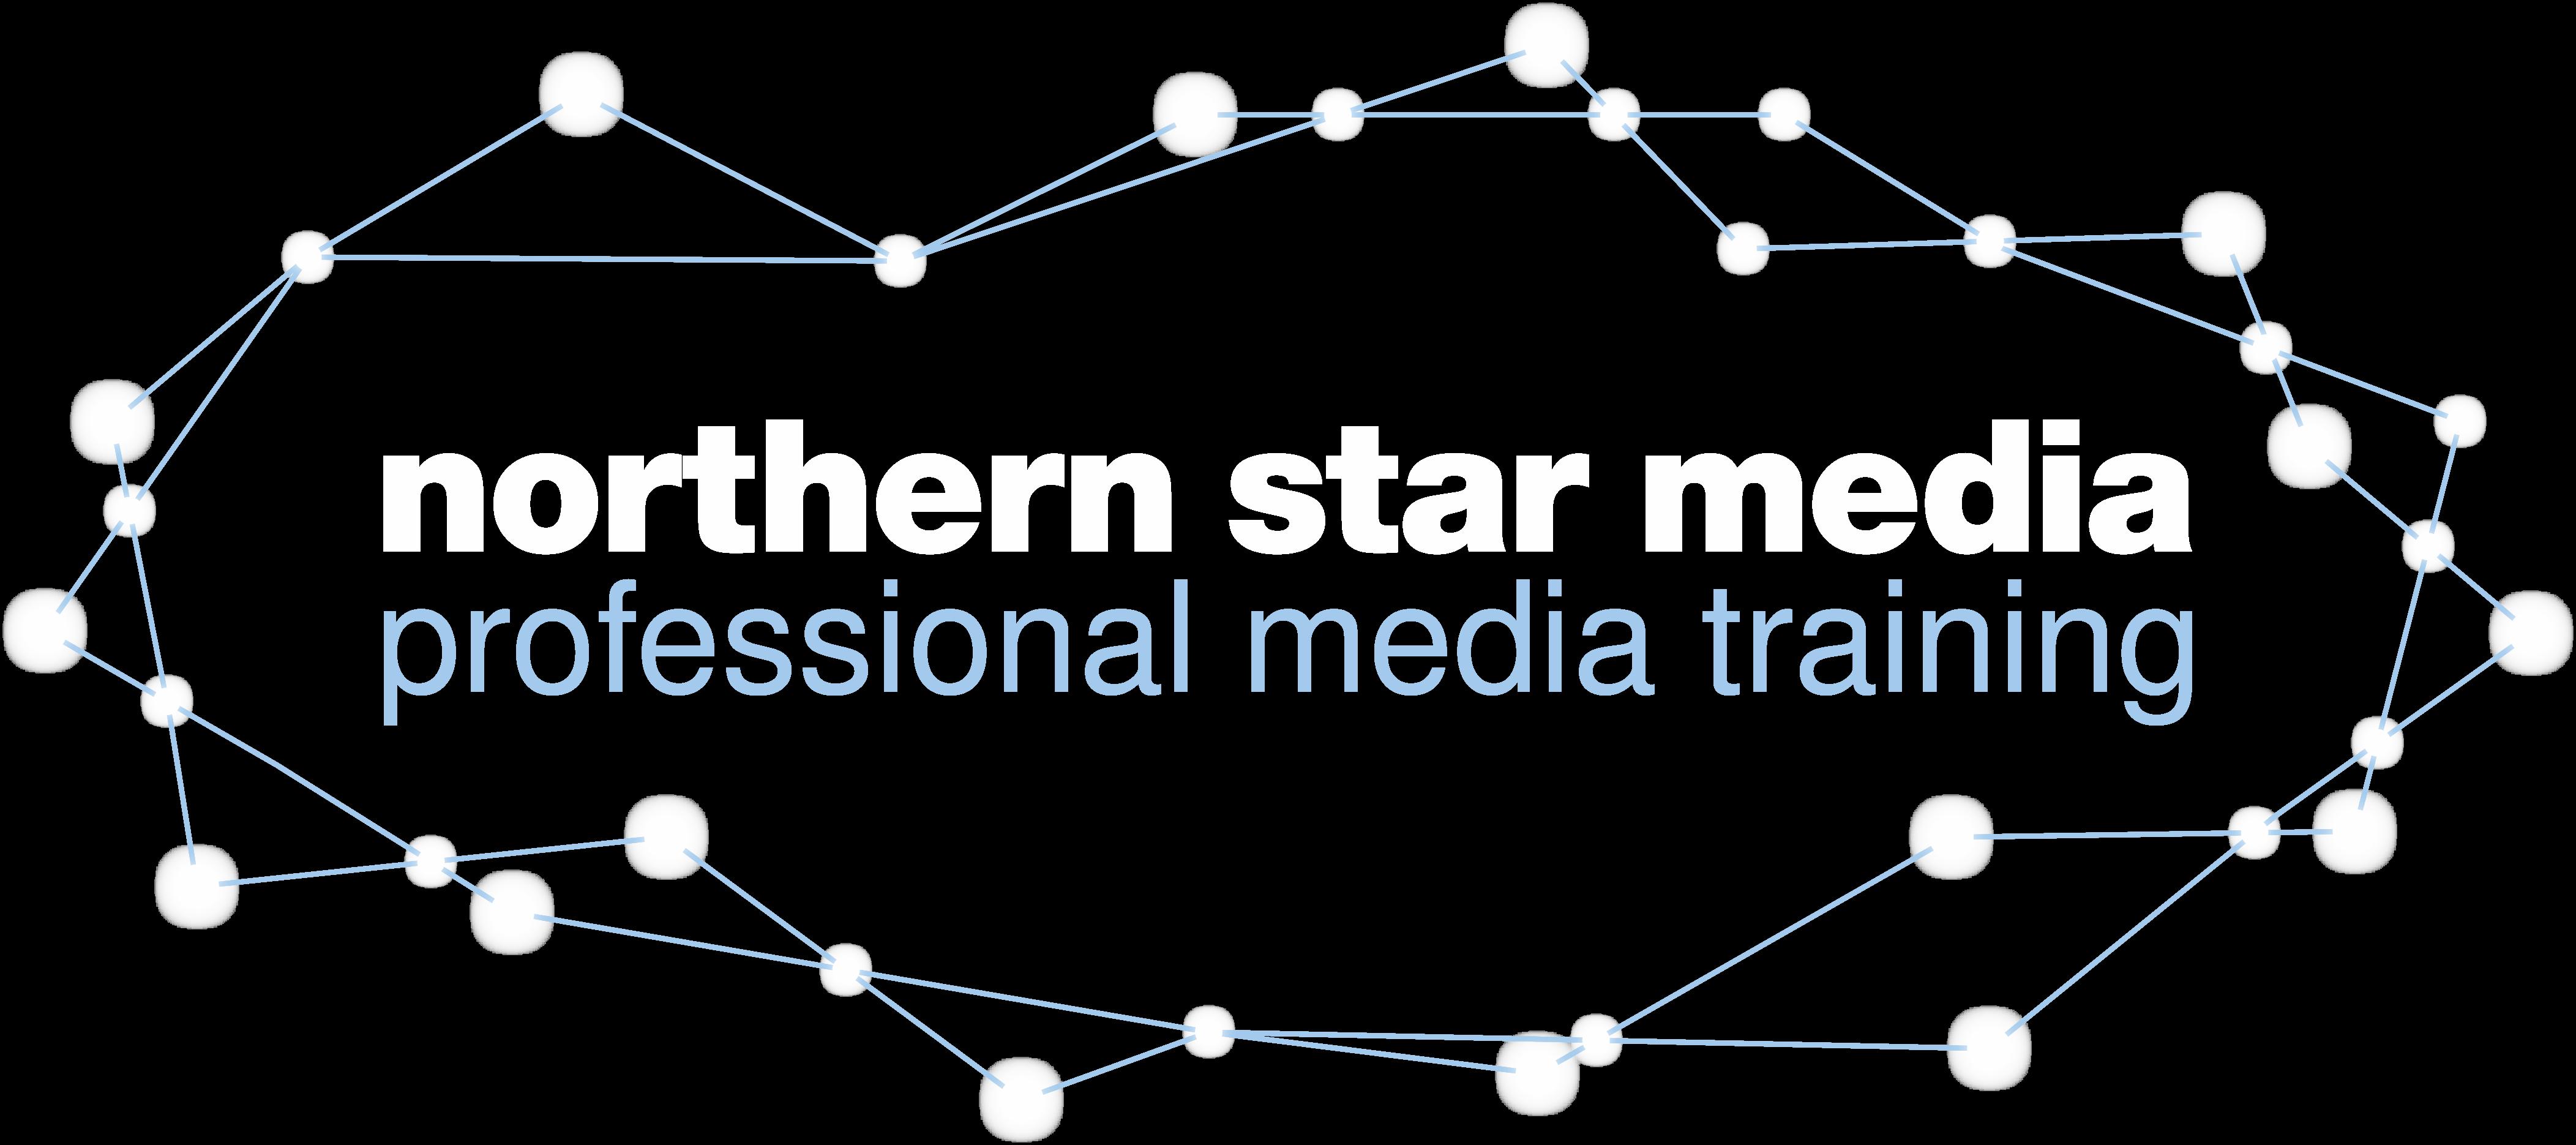 Northern Star Media